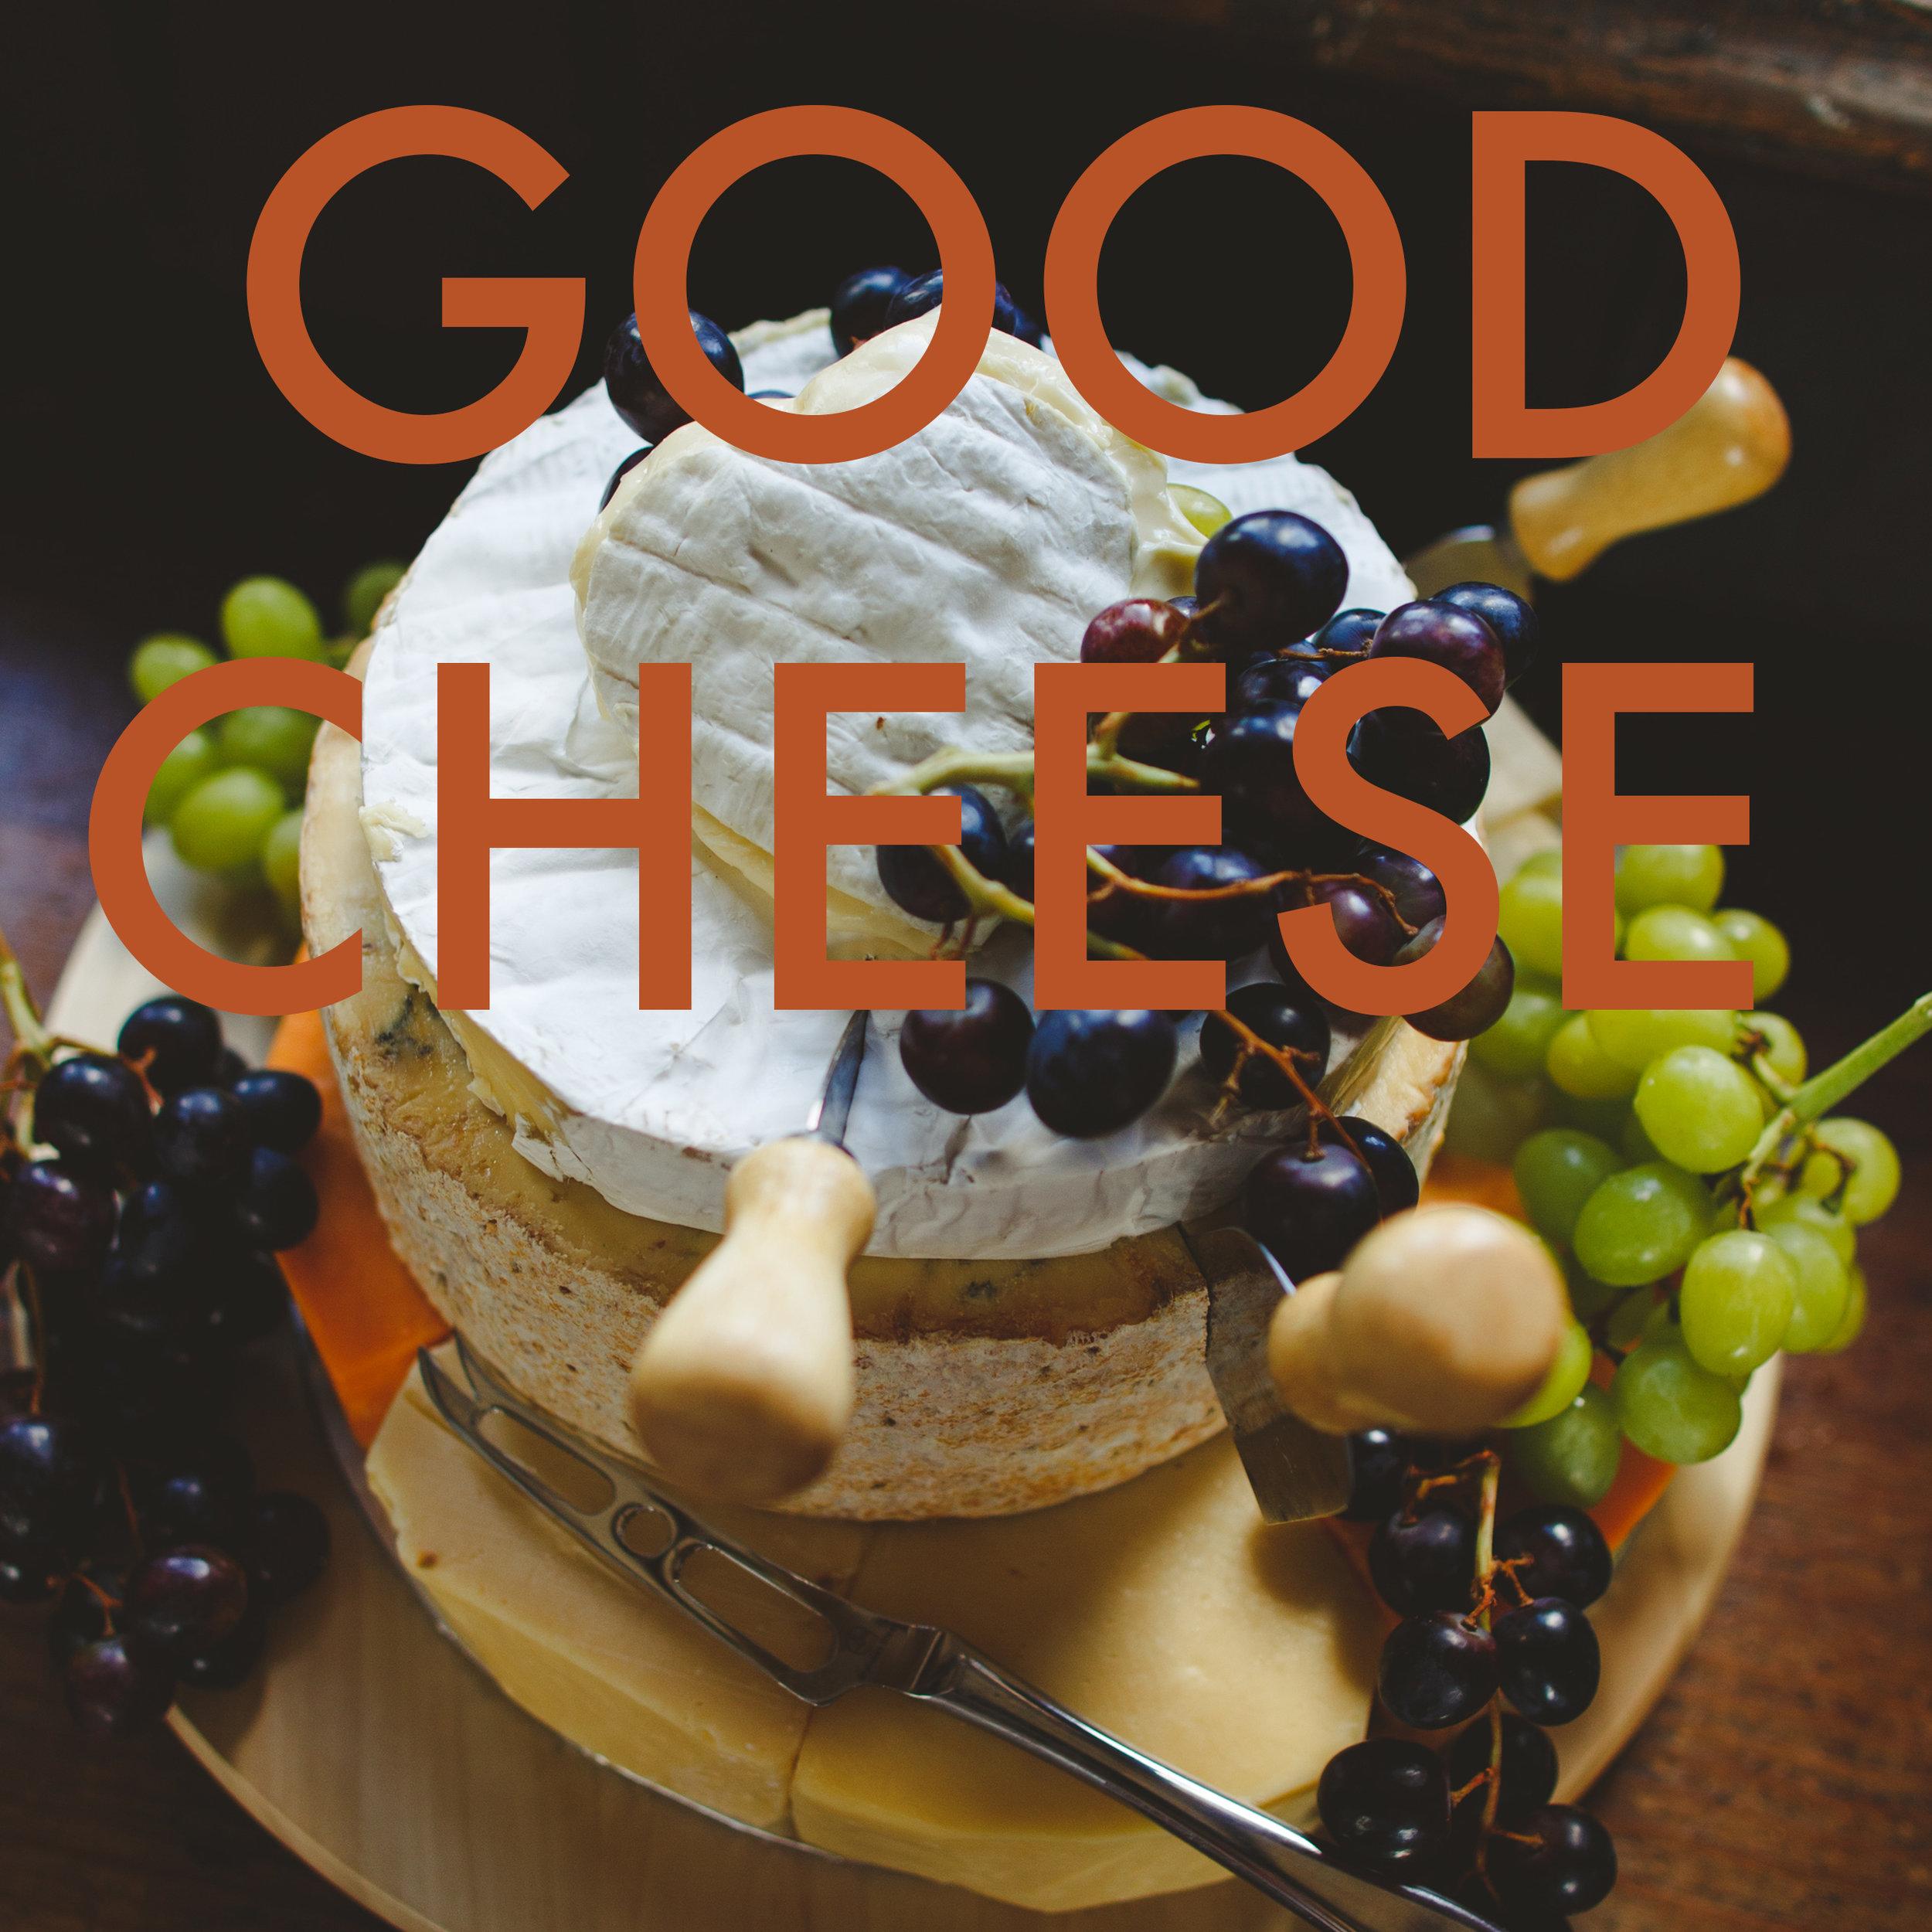 goodcheese.jpg